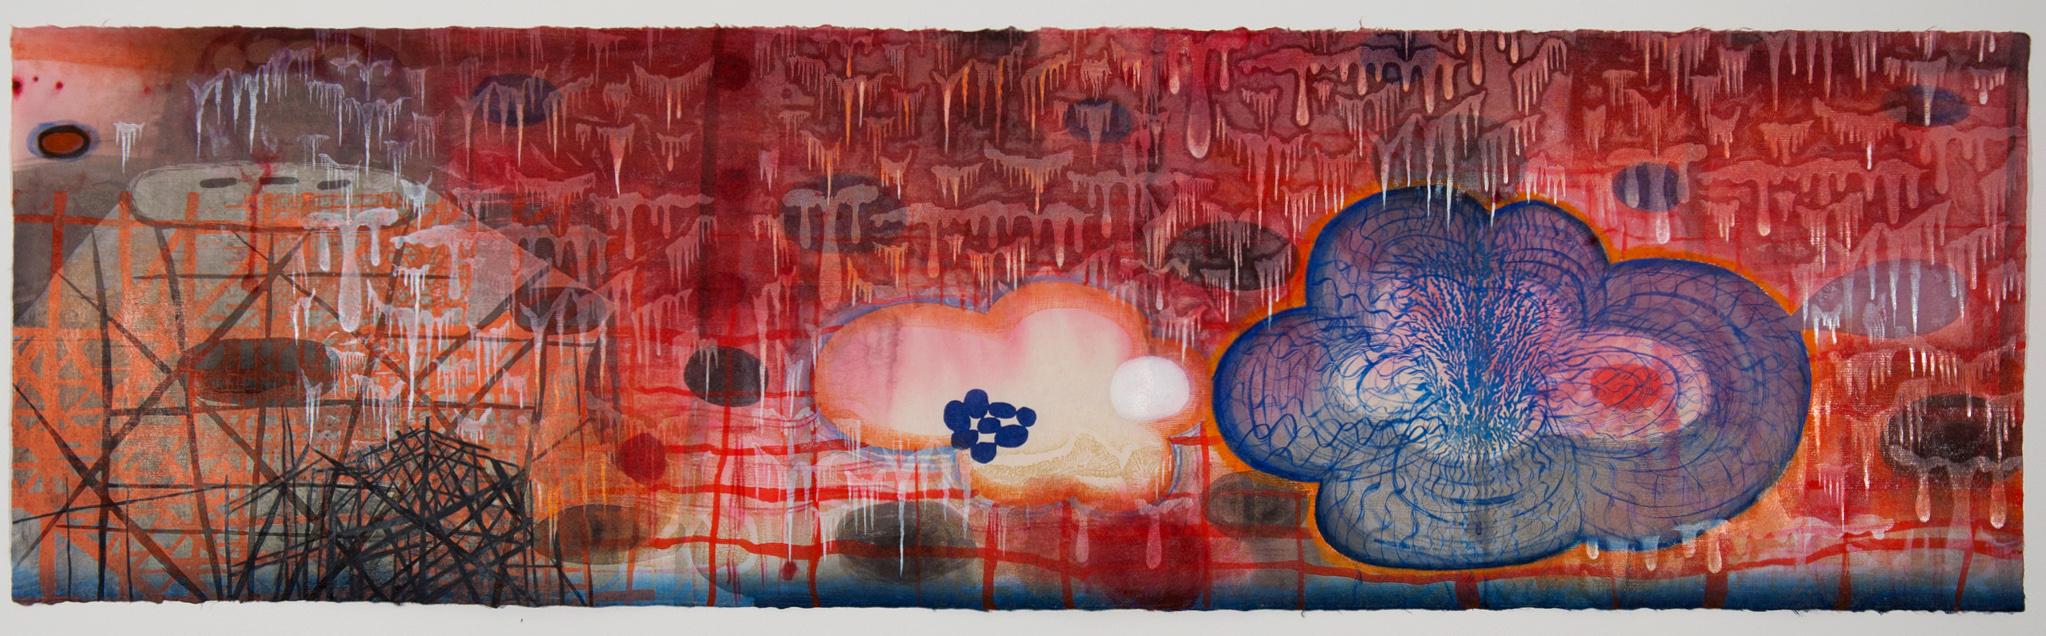 "Artwork by Karen Kunc: ""Red Tide,"" 2010, woodcut, polymer relief, mixed media, 1"